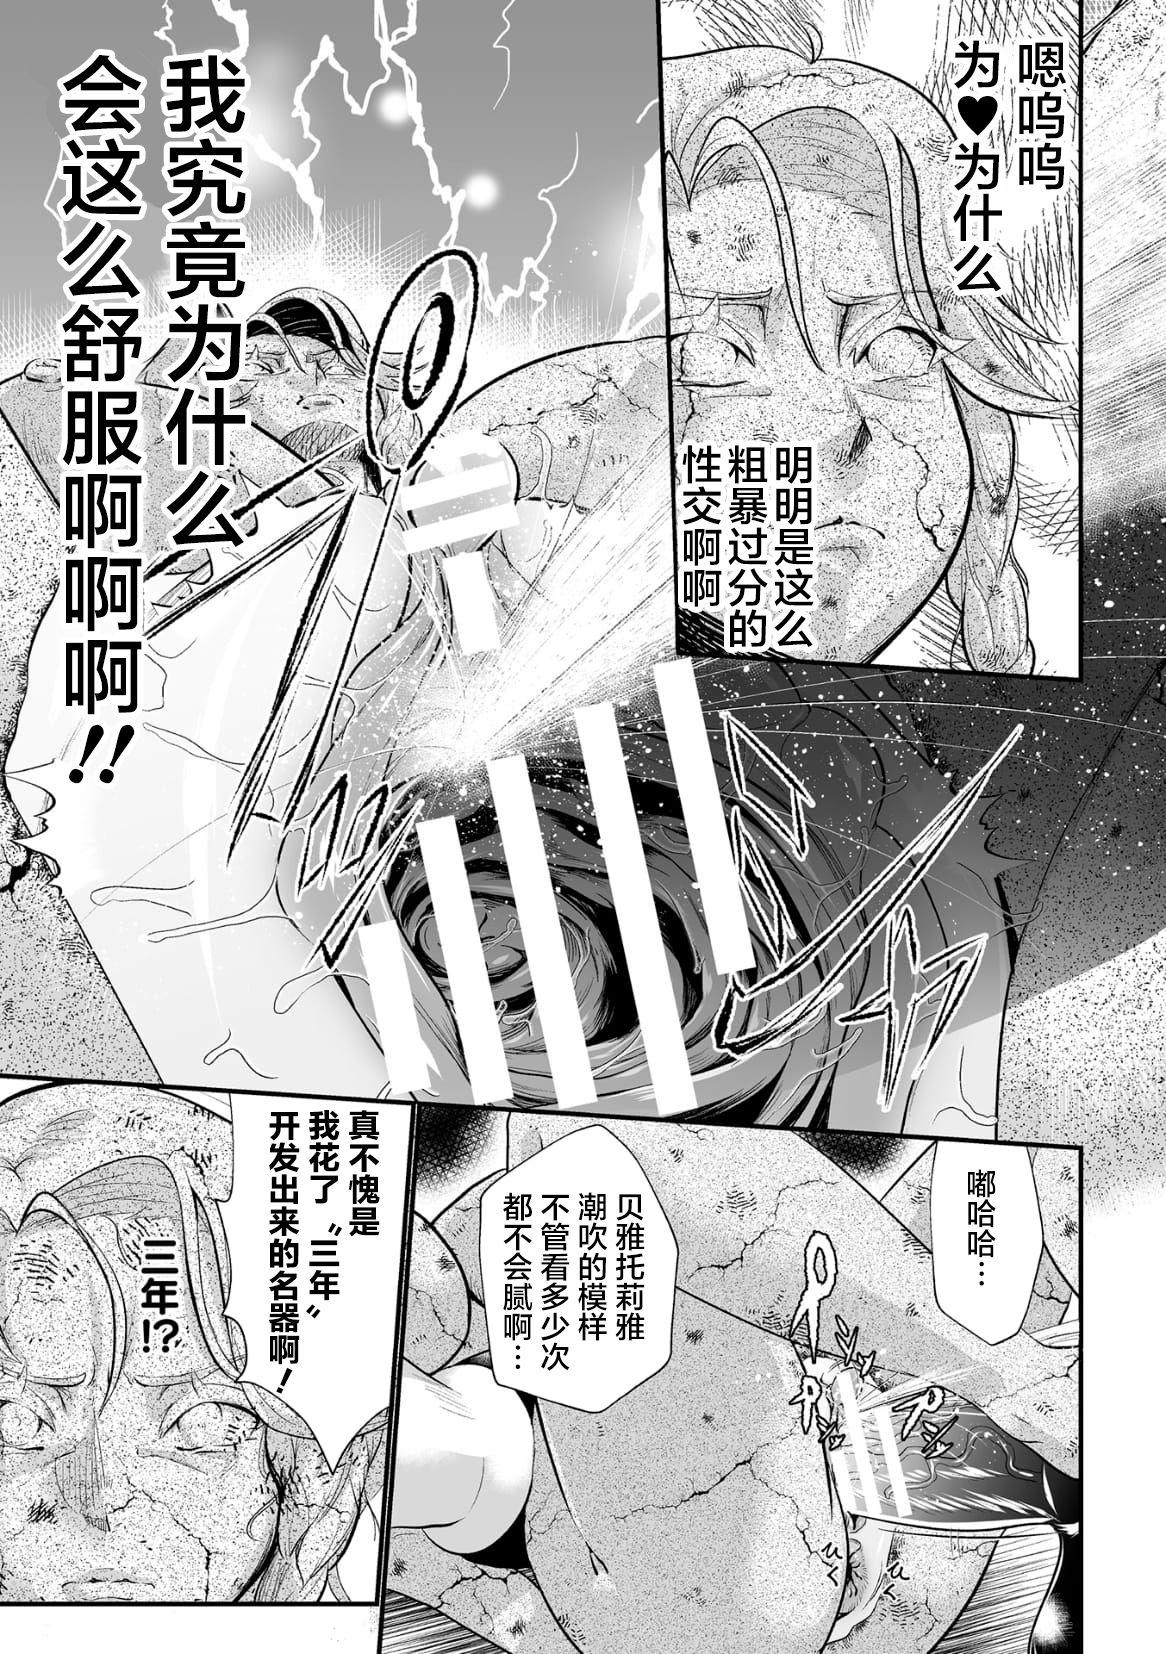 [Mou] Sekkan Fuuin ~Enbi na Sekizou ni Otosareshi Yuusha Ichizoku~ Ch. 1 [Chinese] [不咕鸟汉化组] 20